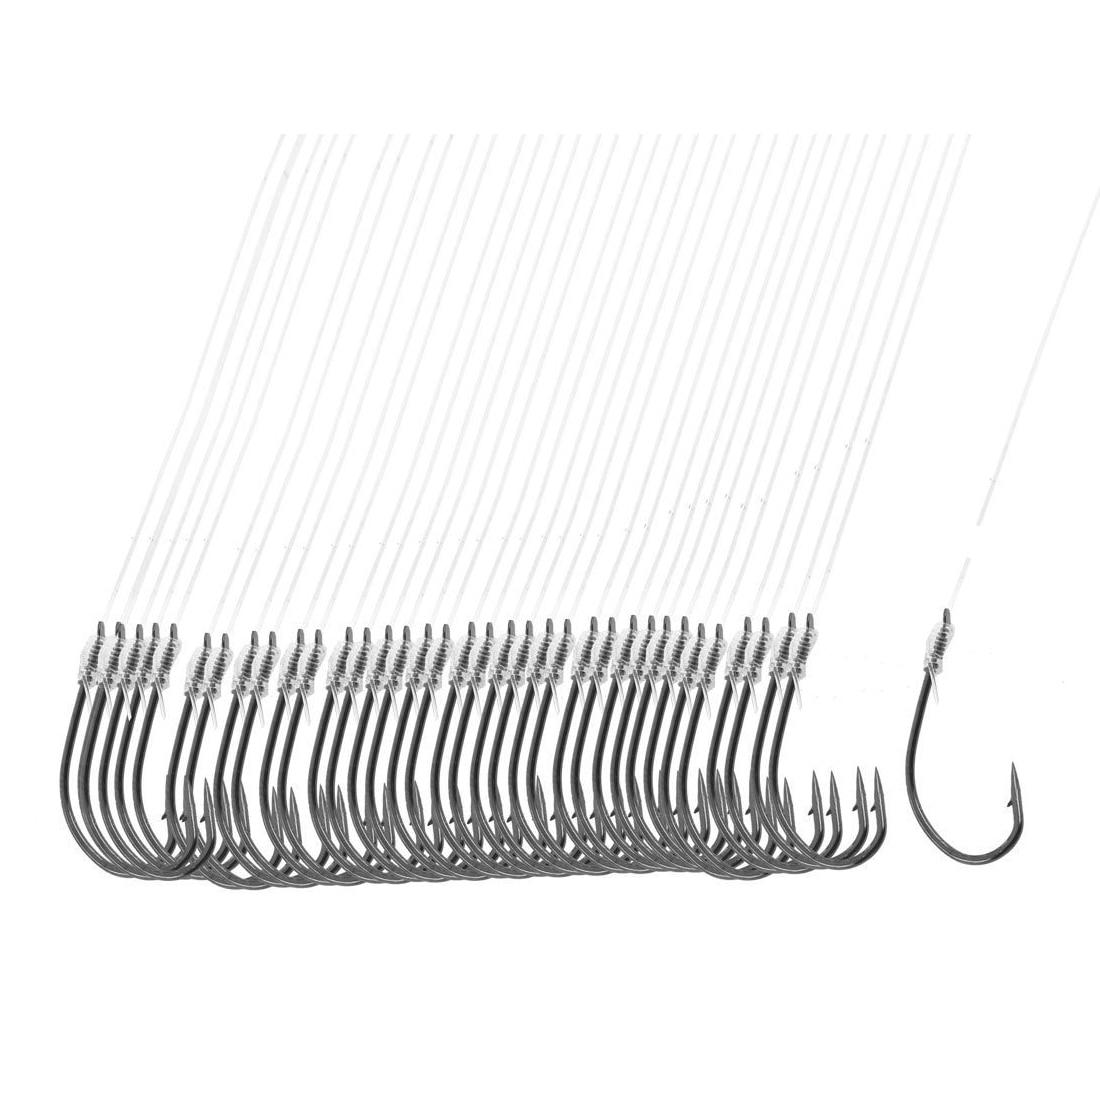 40-pcs-20-long-font-b-fishing-b-font-line-8-darl-gray-metal-fish-hooks